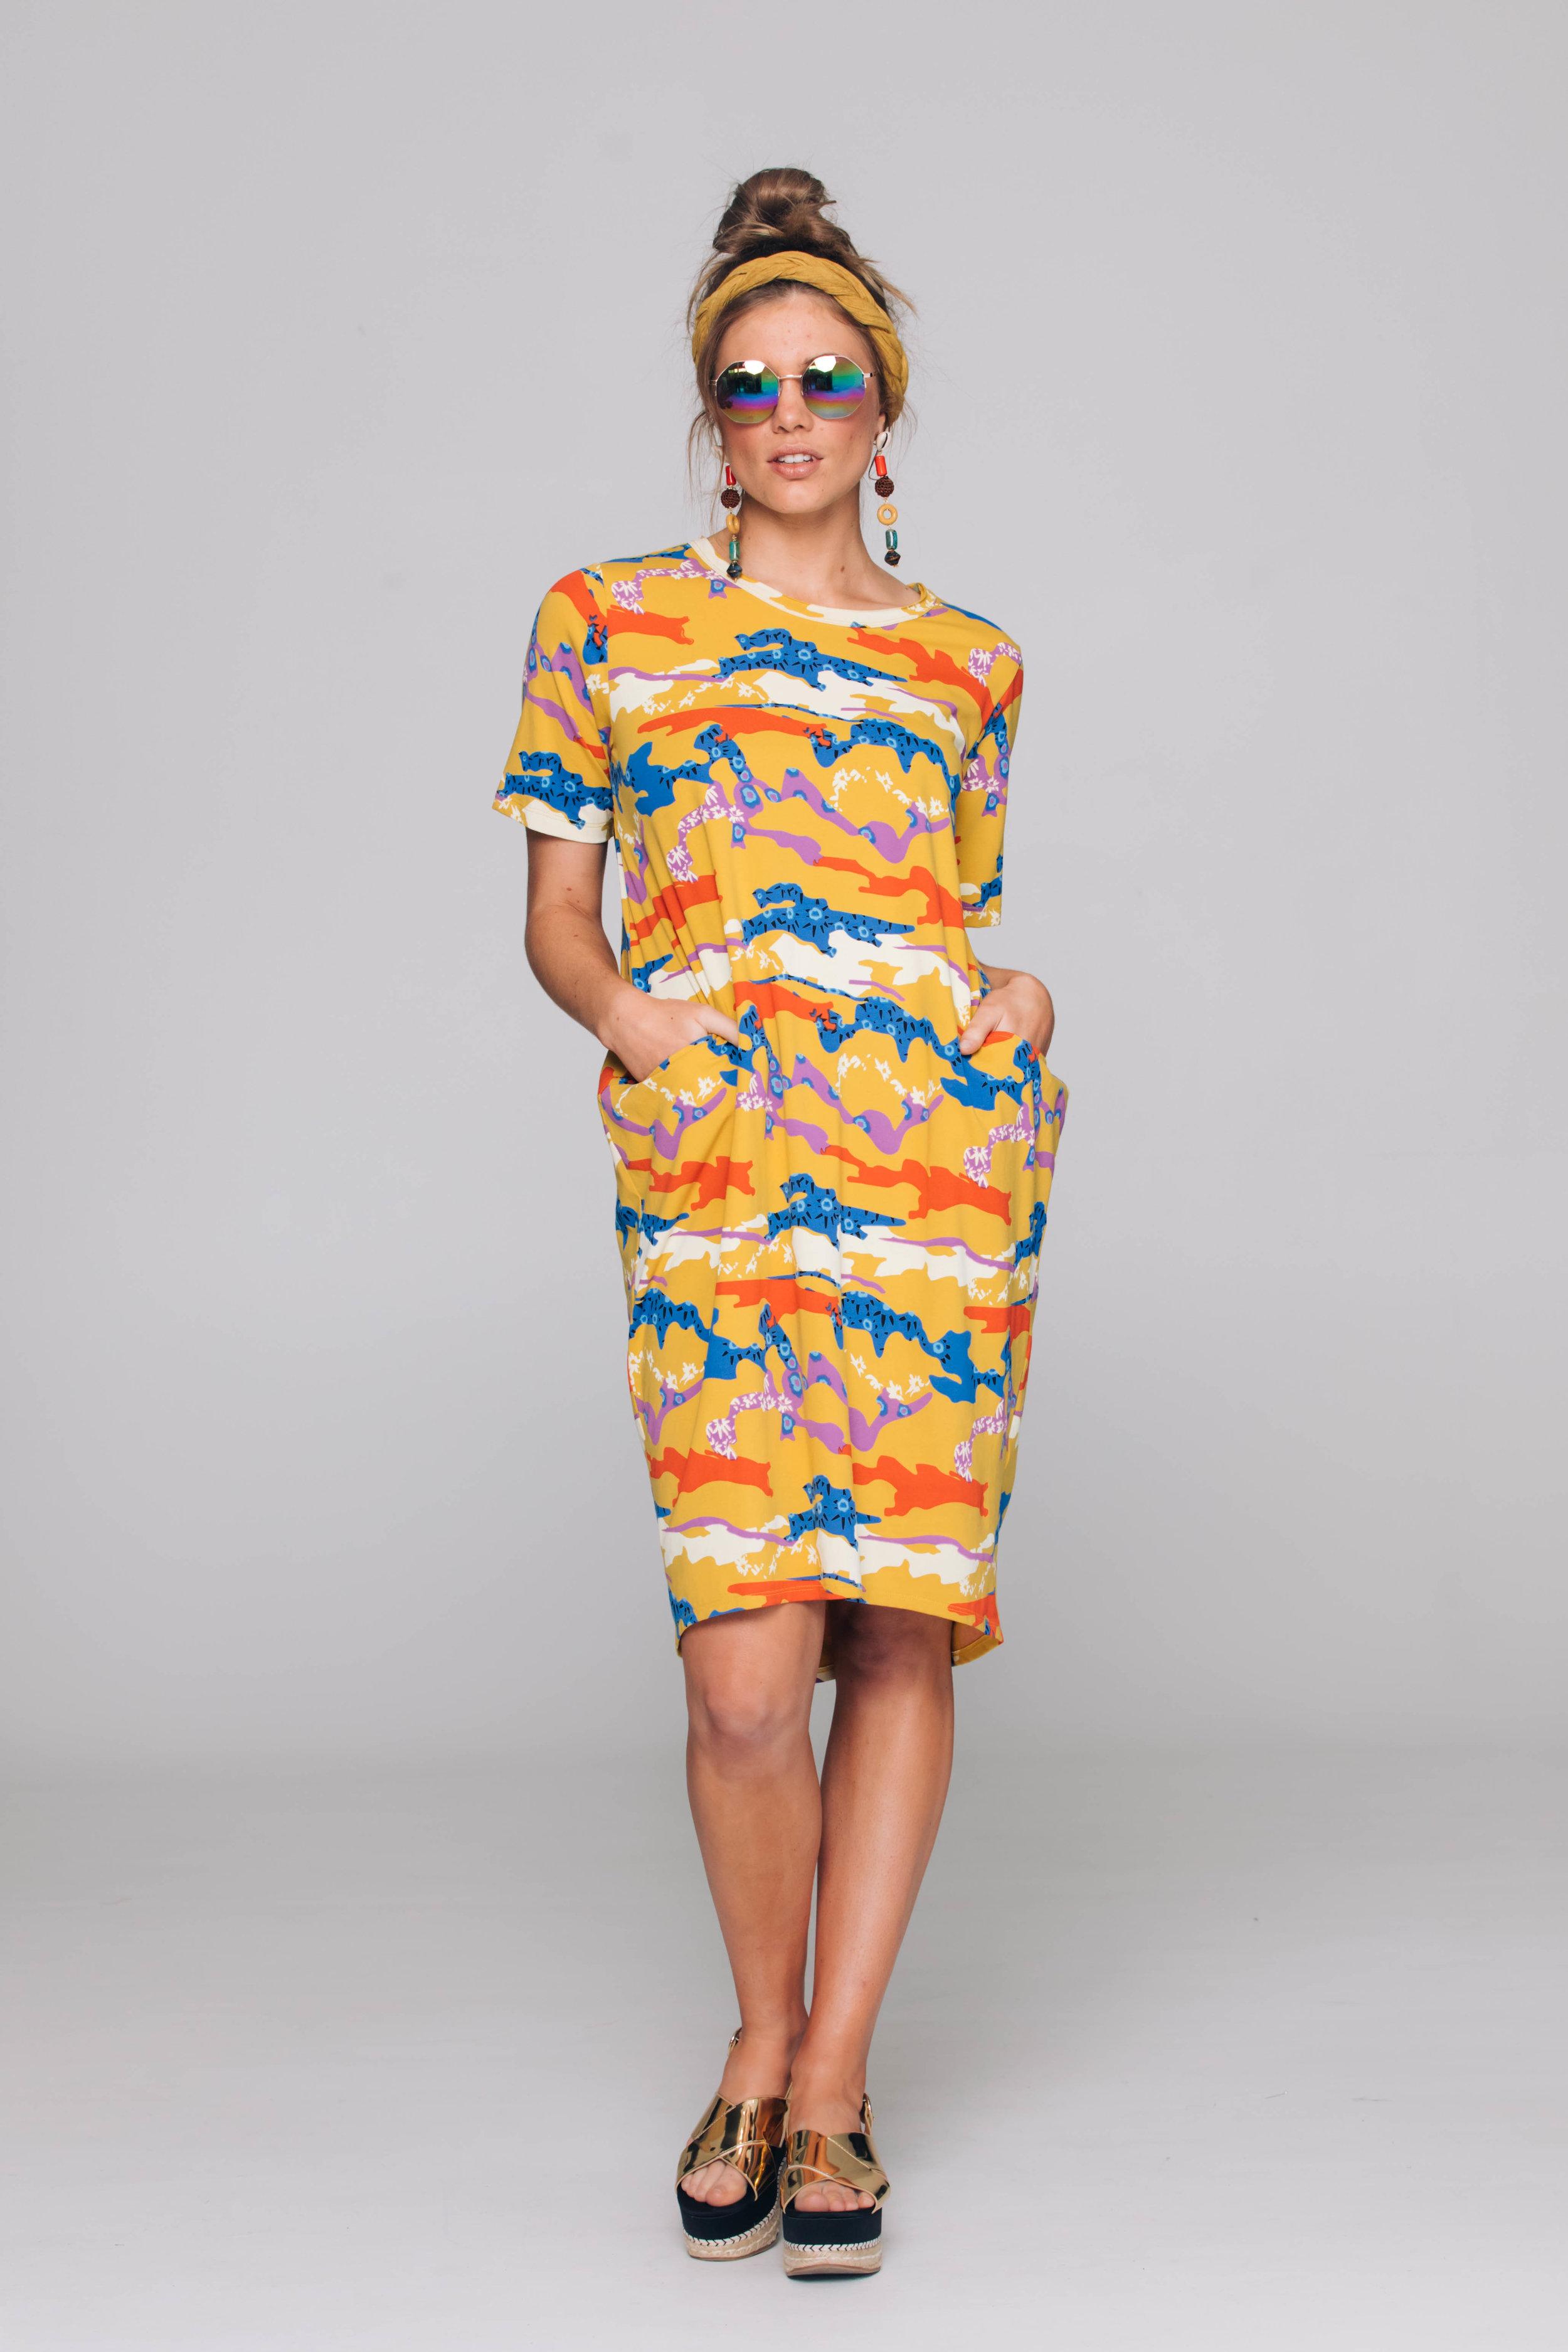 6163T Halo Dress, Cactus Mustard